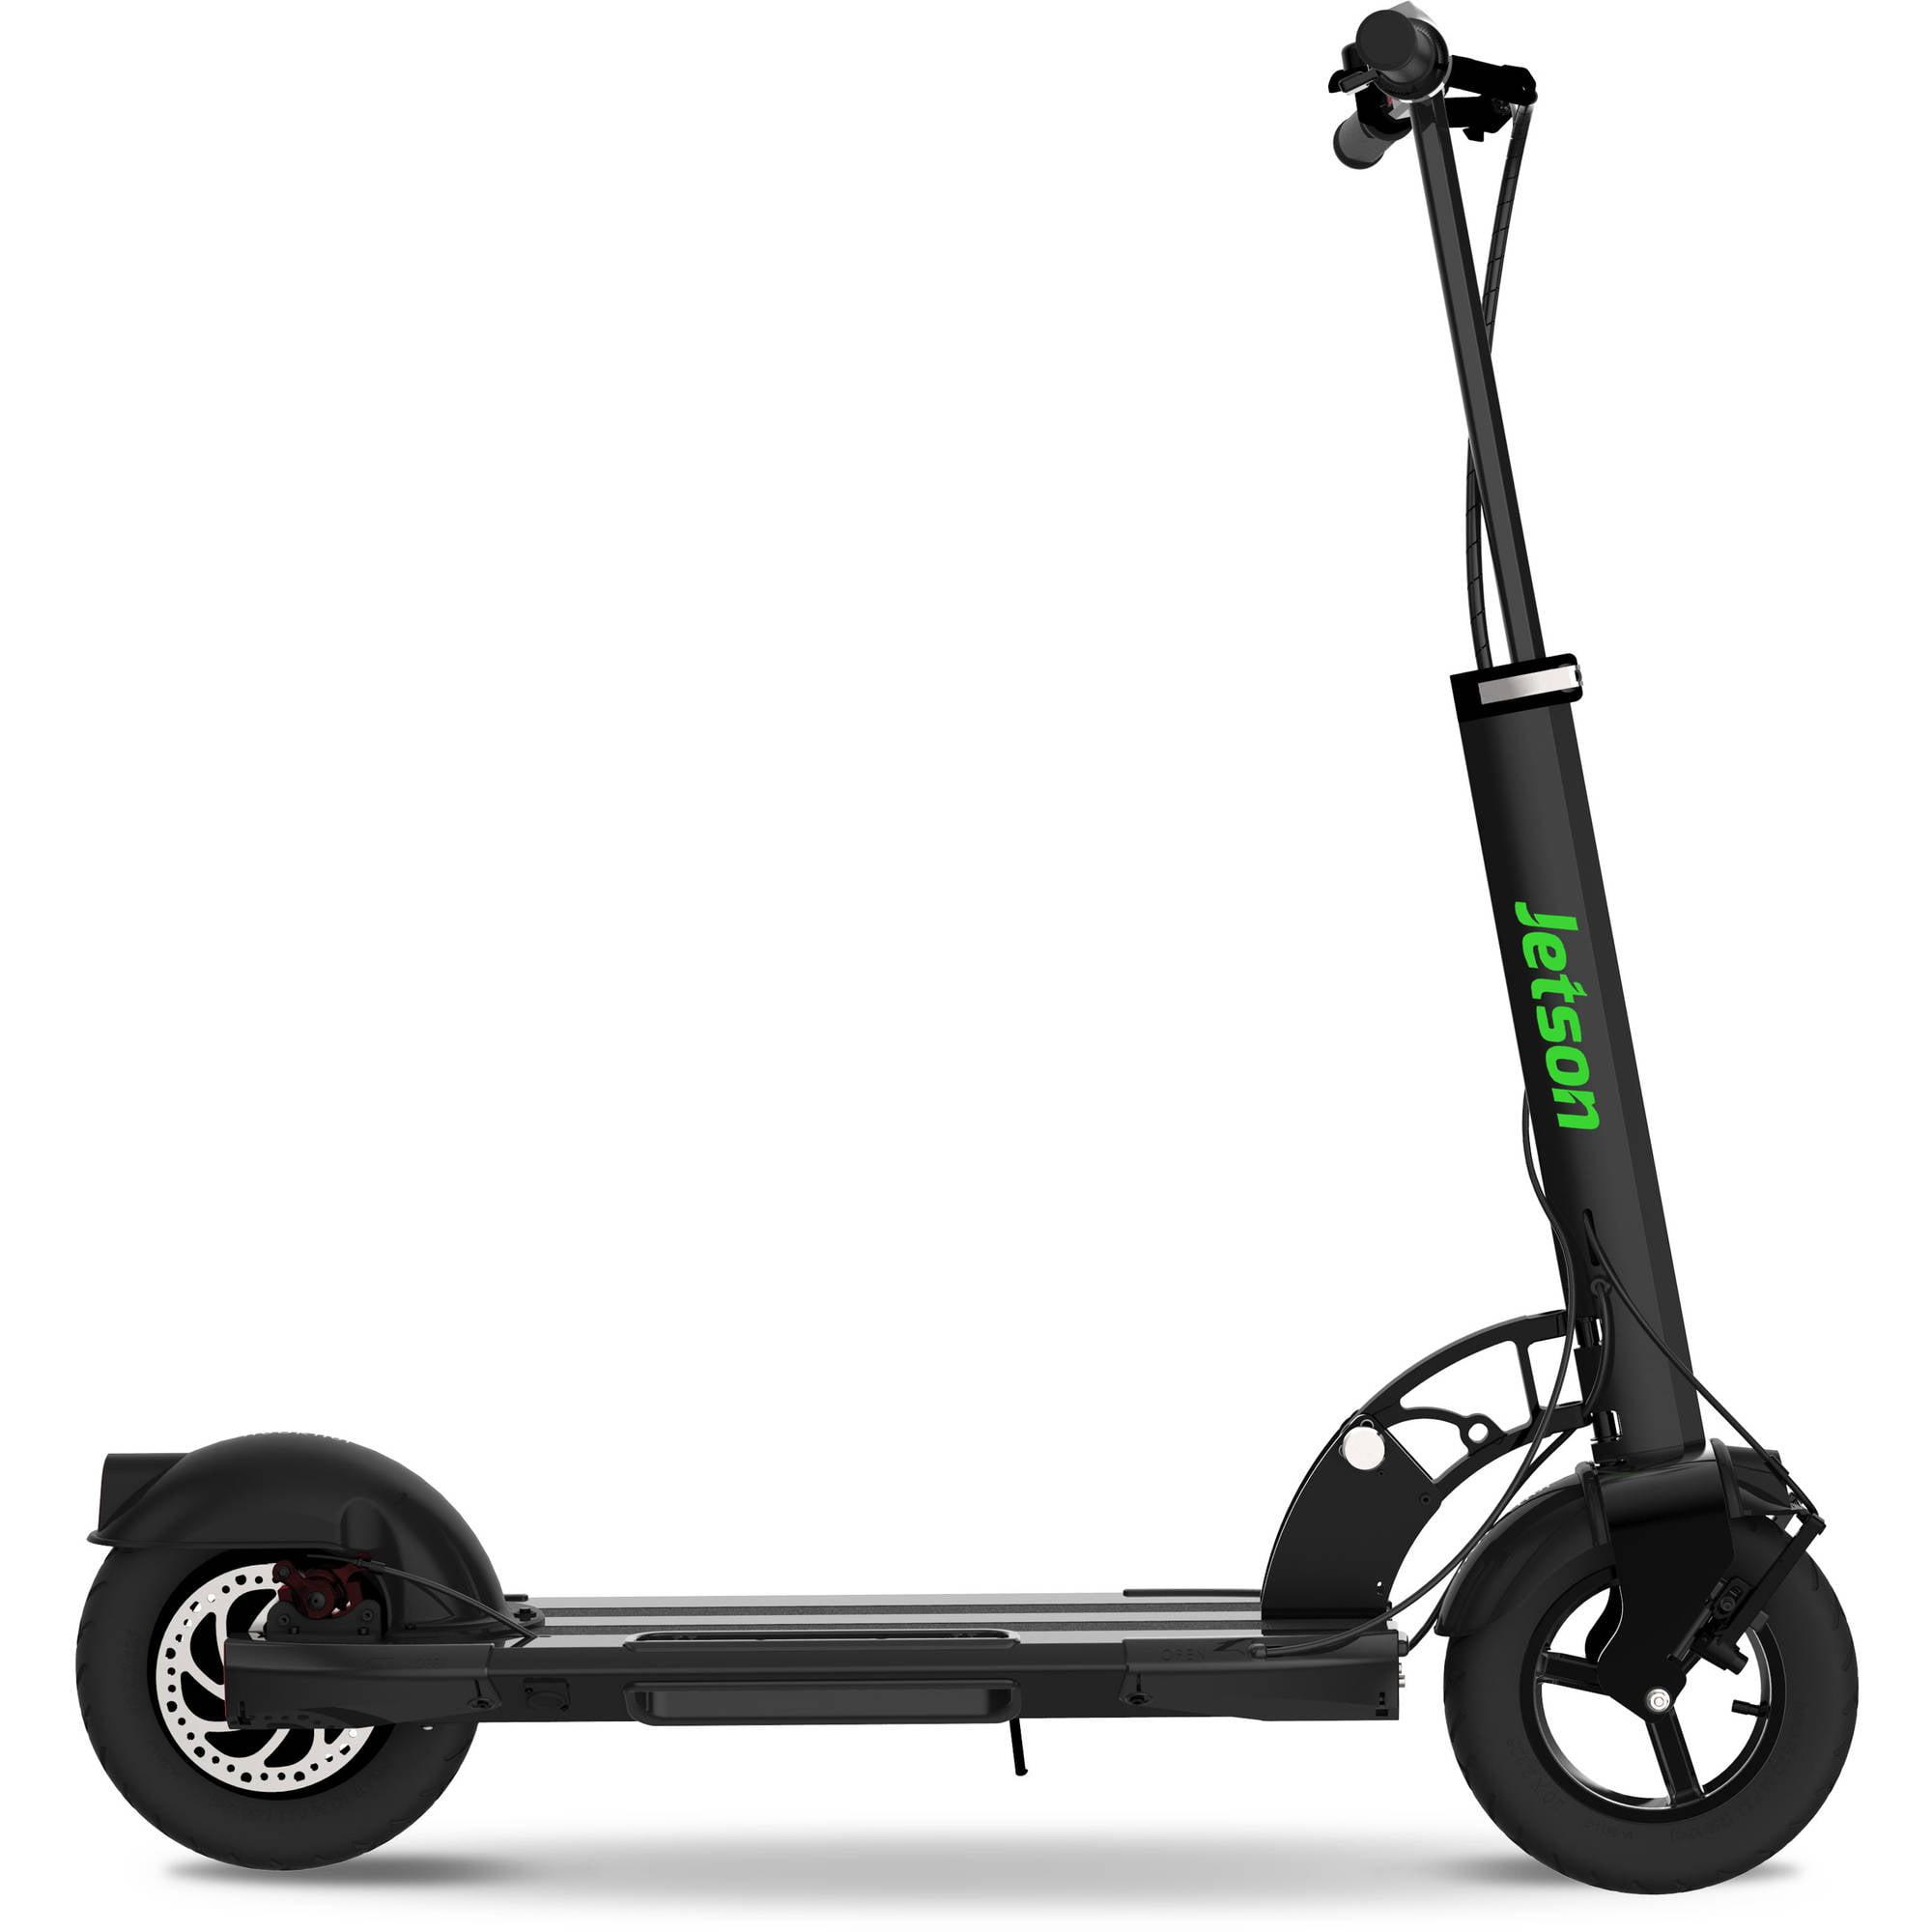 Jetson Breeze Folding Electric Scooter Walmart Com